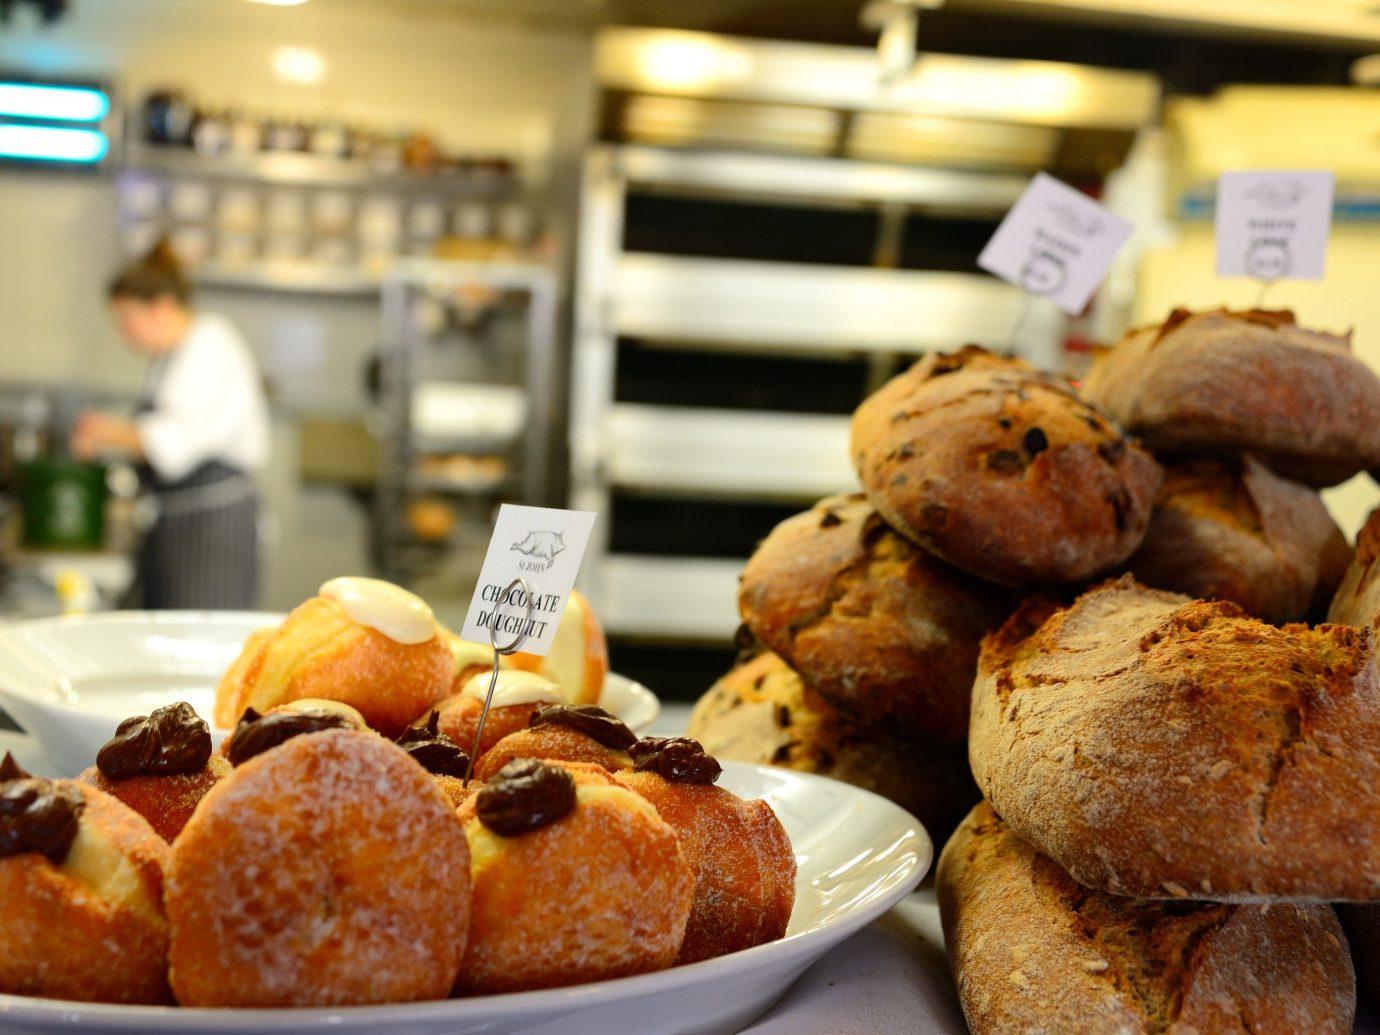 Donuts in a bakery in London